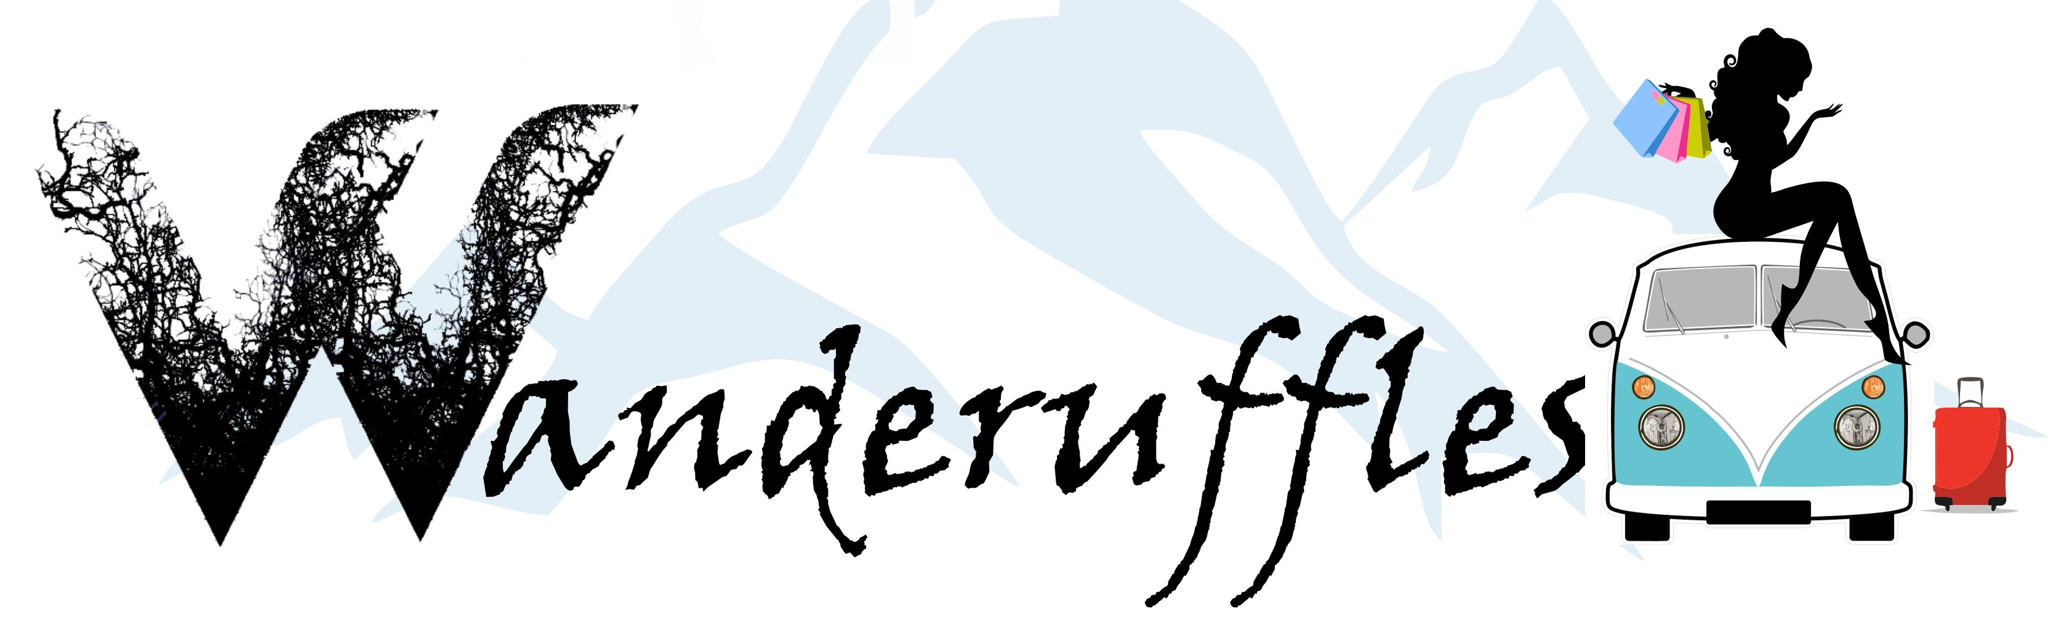 Wanderuffles logo